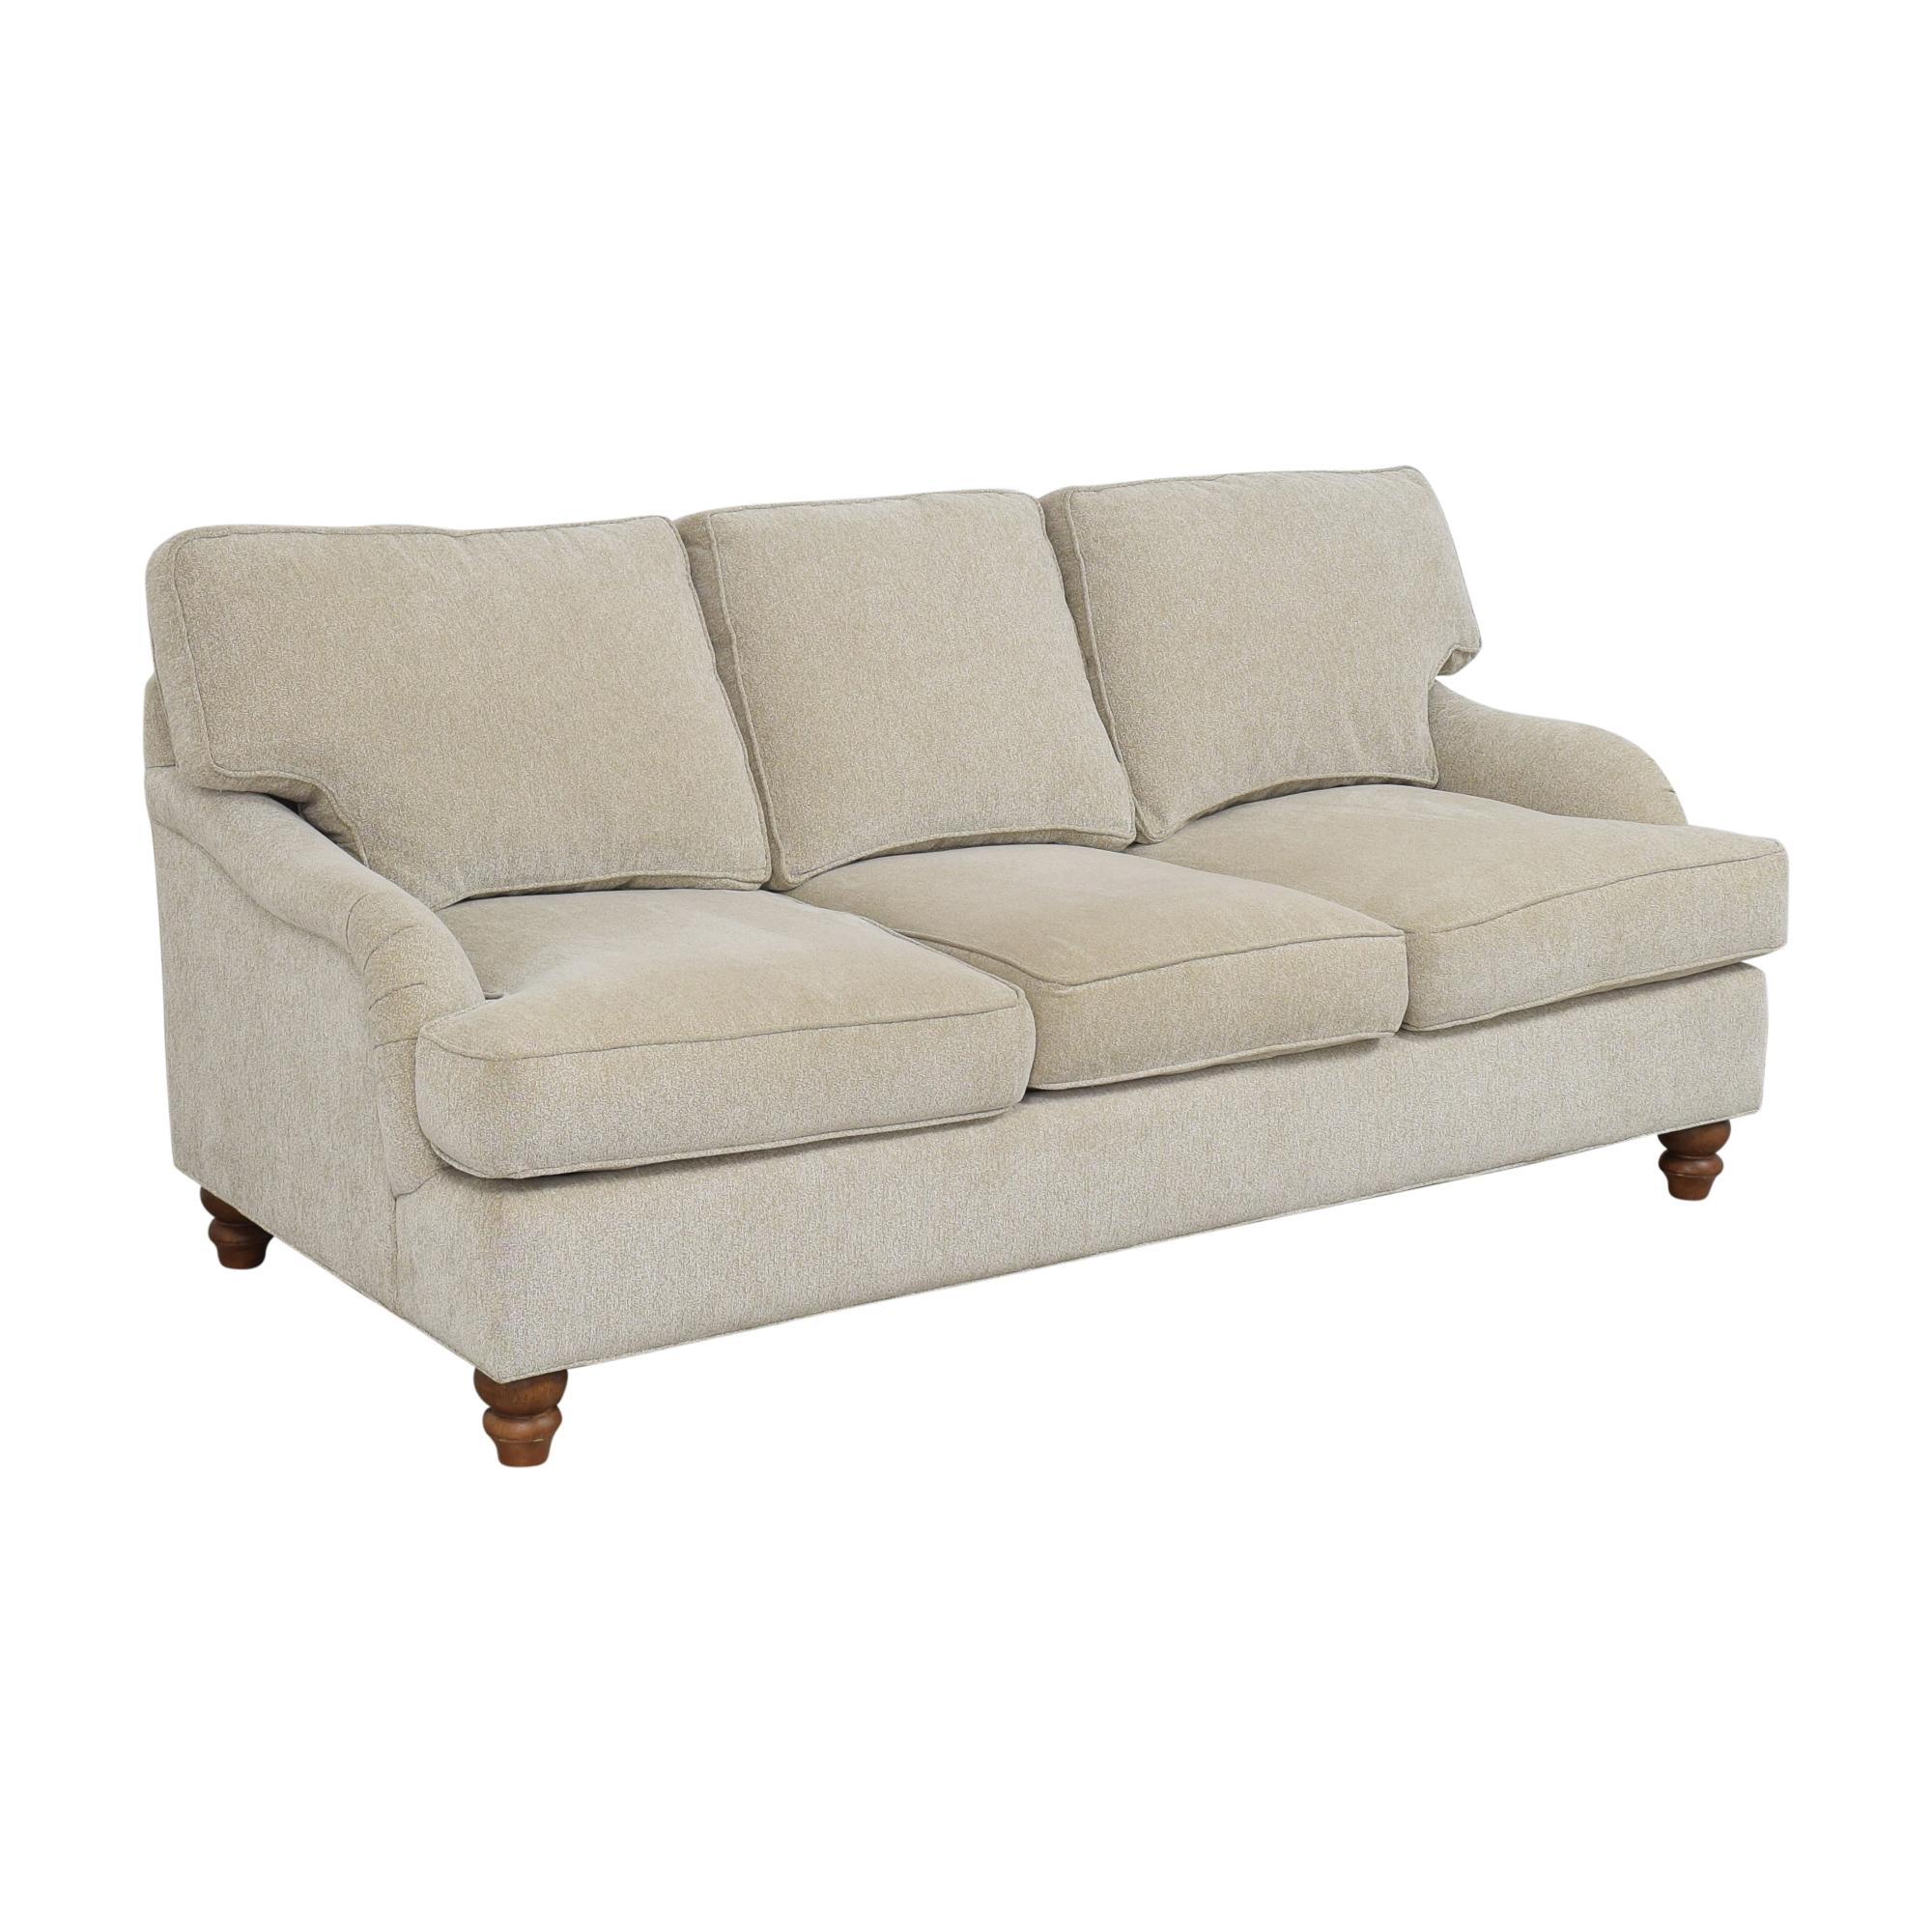 Drexel Heritage Drexel Heritage Three Cushion Sofa nj